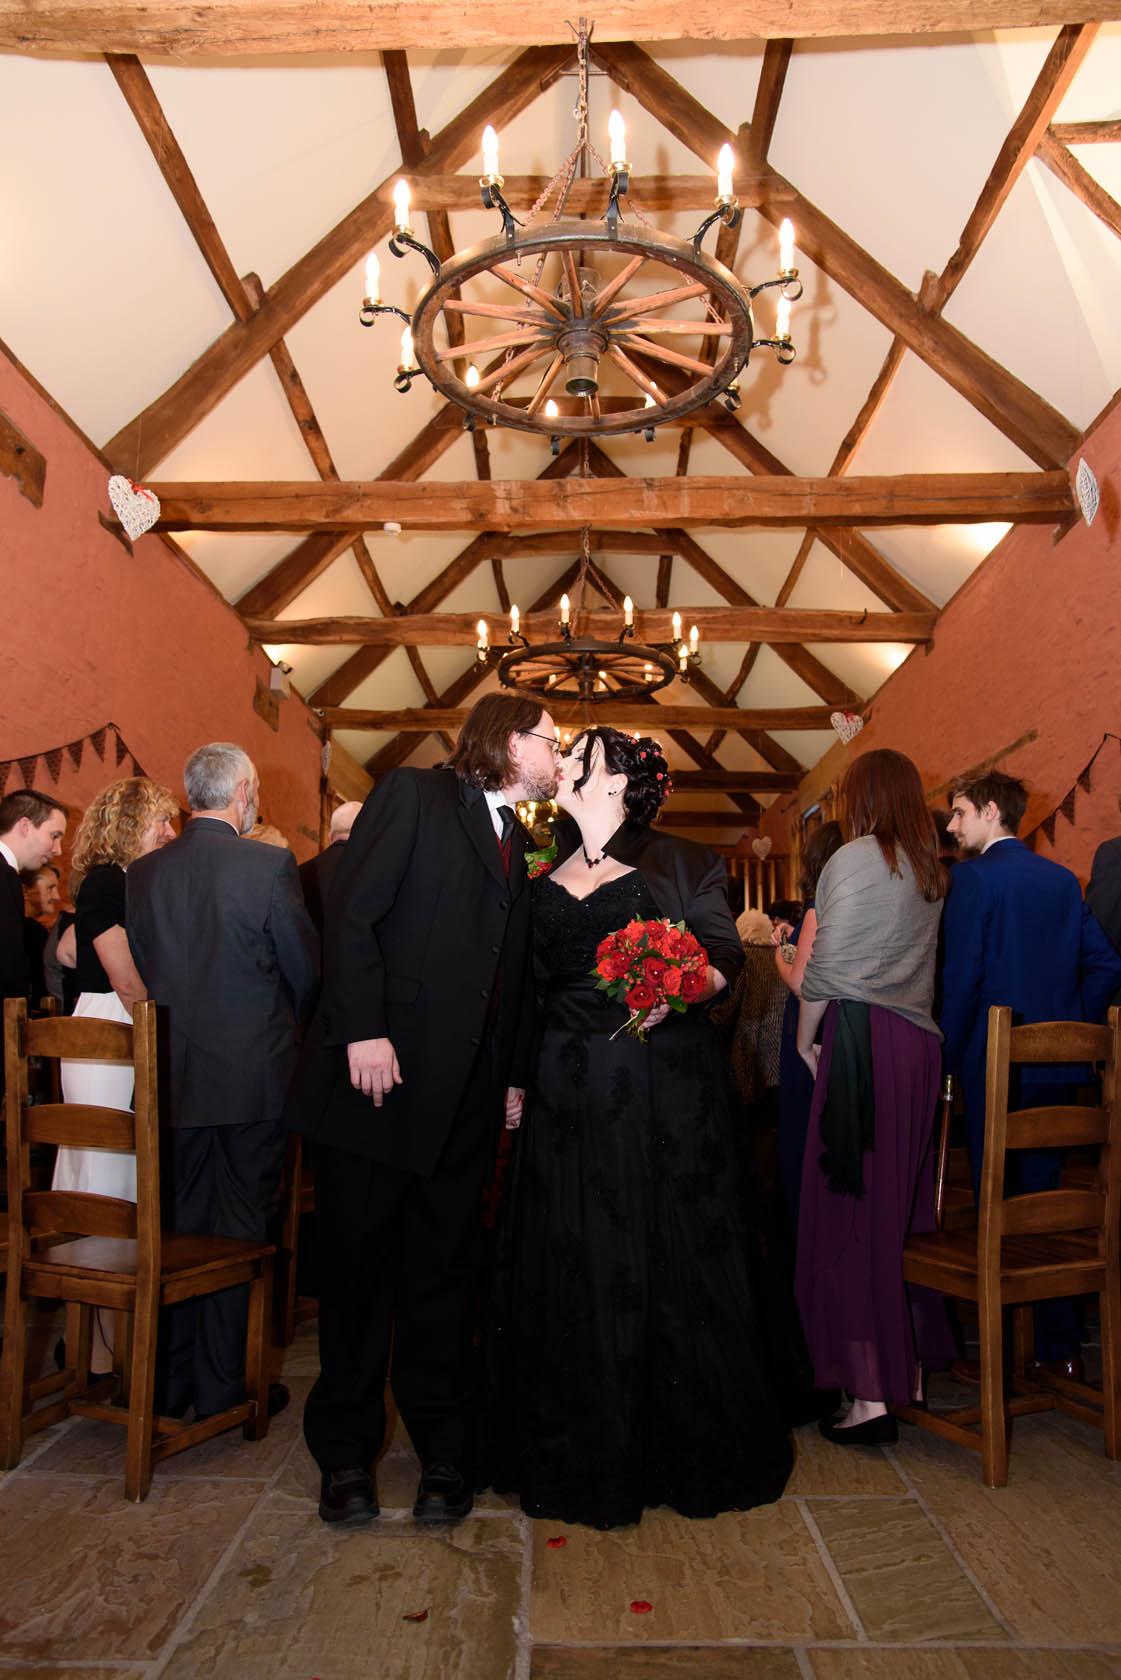 Wedding Photography The Barn at Brynich